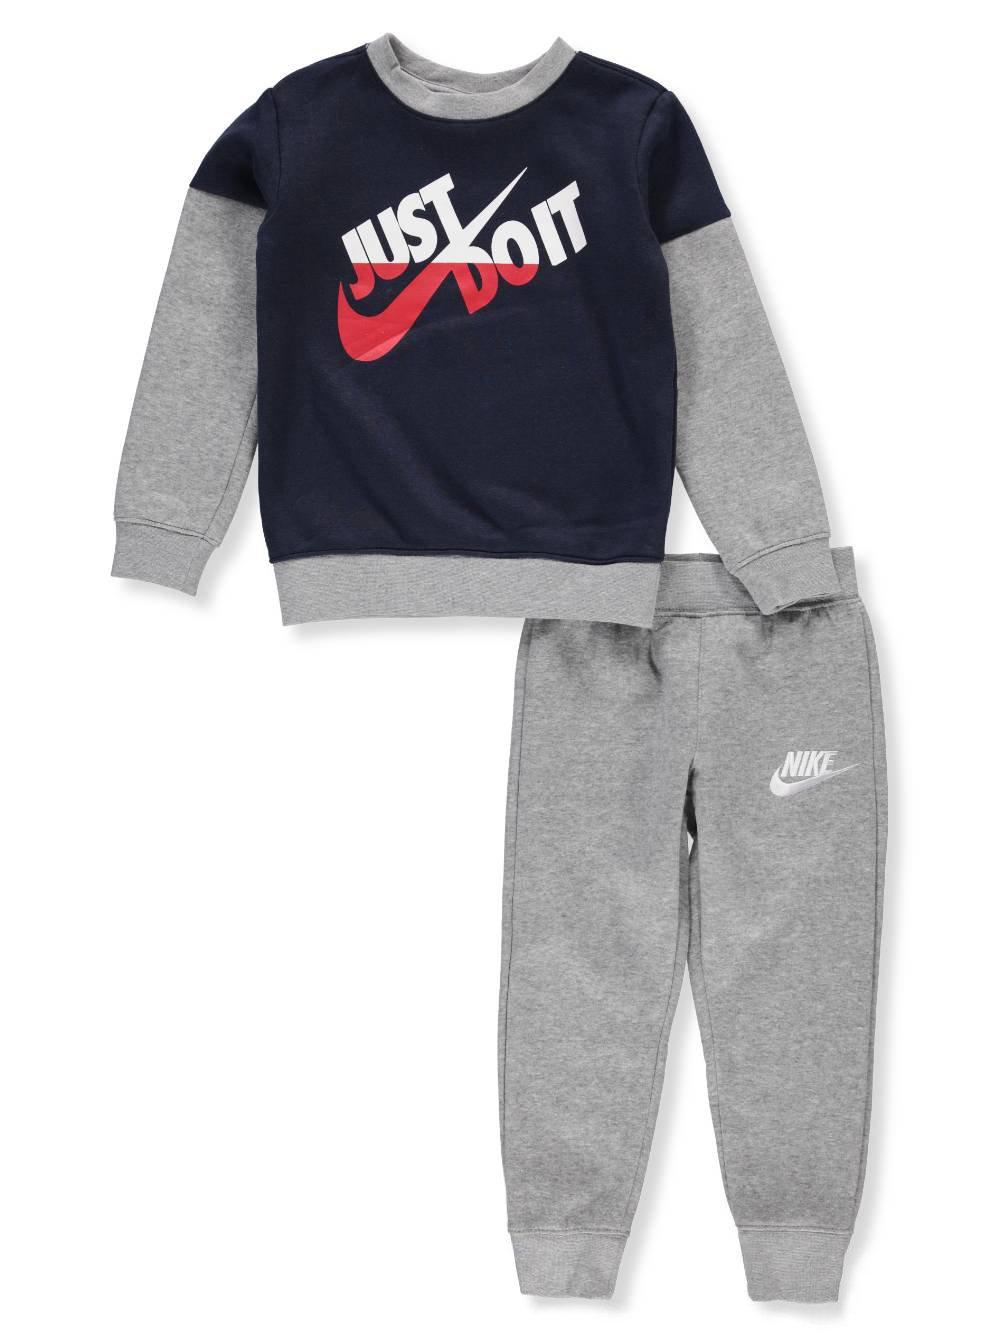 Nike Boys' 2-Piece Sweatsuit Pants Set - Dark Gray, 2t